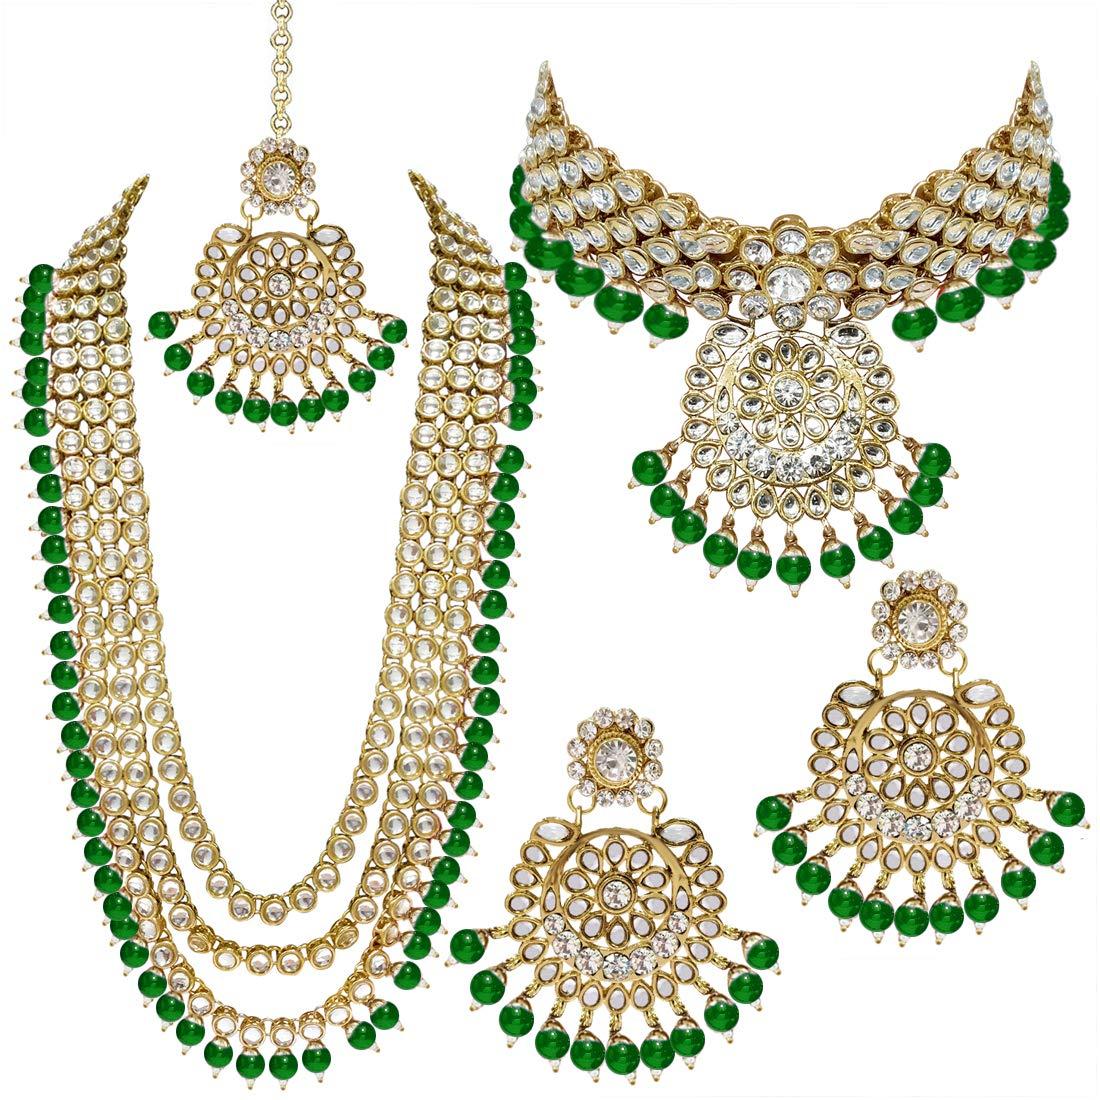 Aheli Indian Wedding Kundan Beaded Bridal Long Choker Necklace Earrings with Maang Tikka Traditional Jewelry Set for Women (Green)